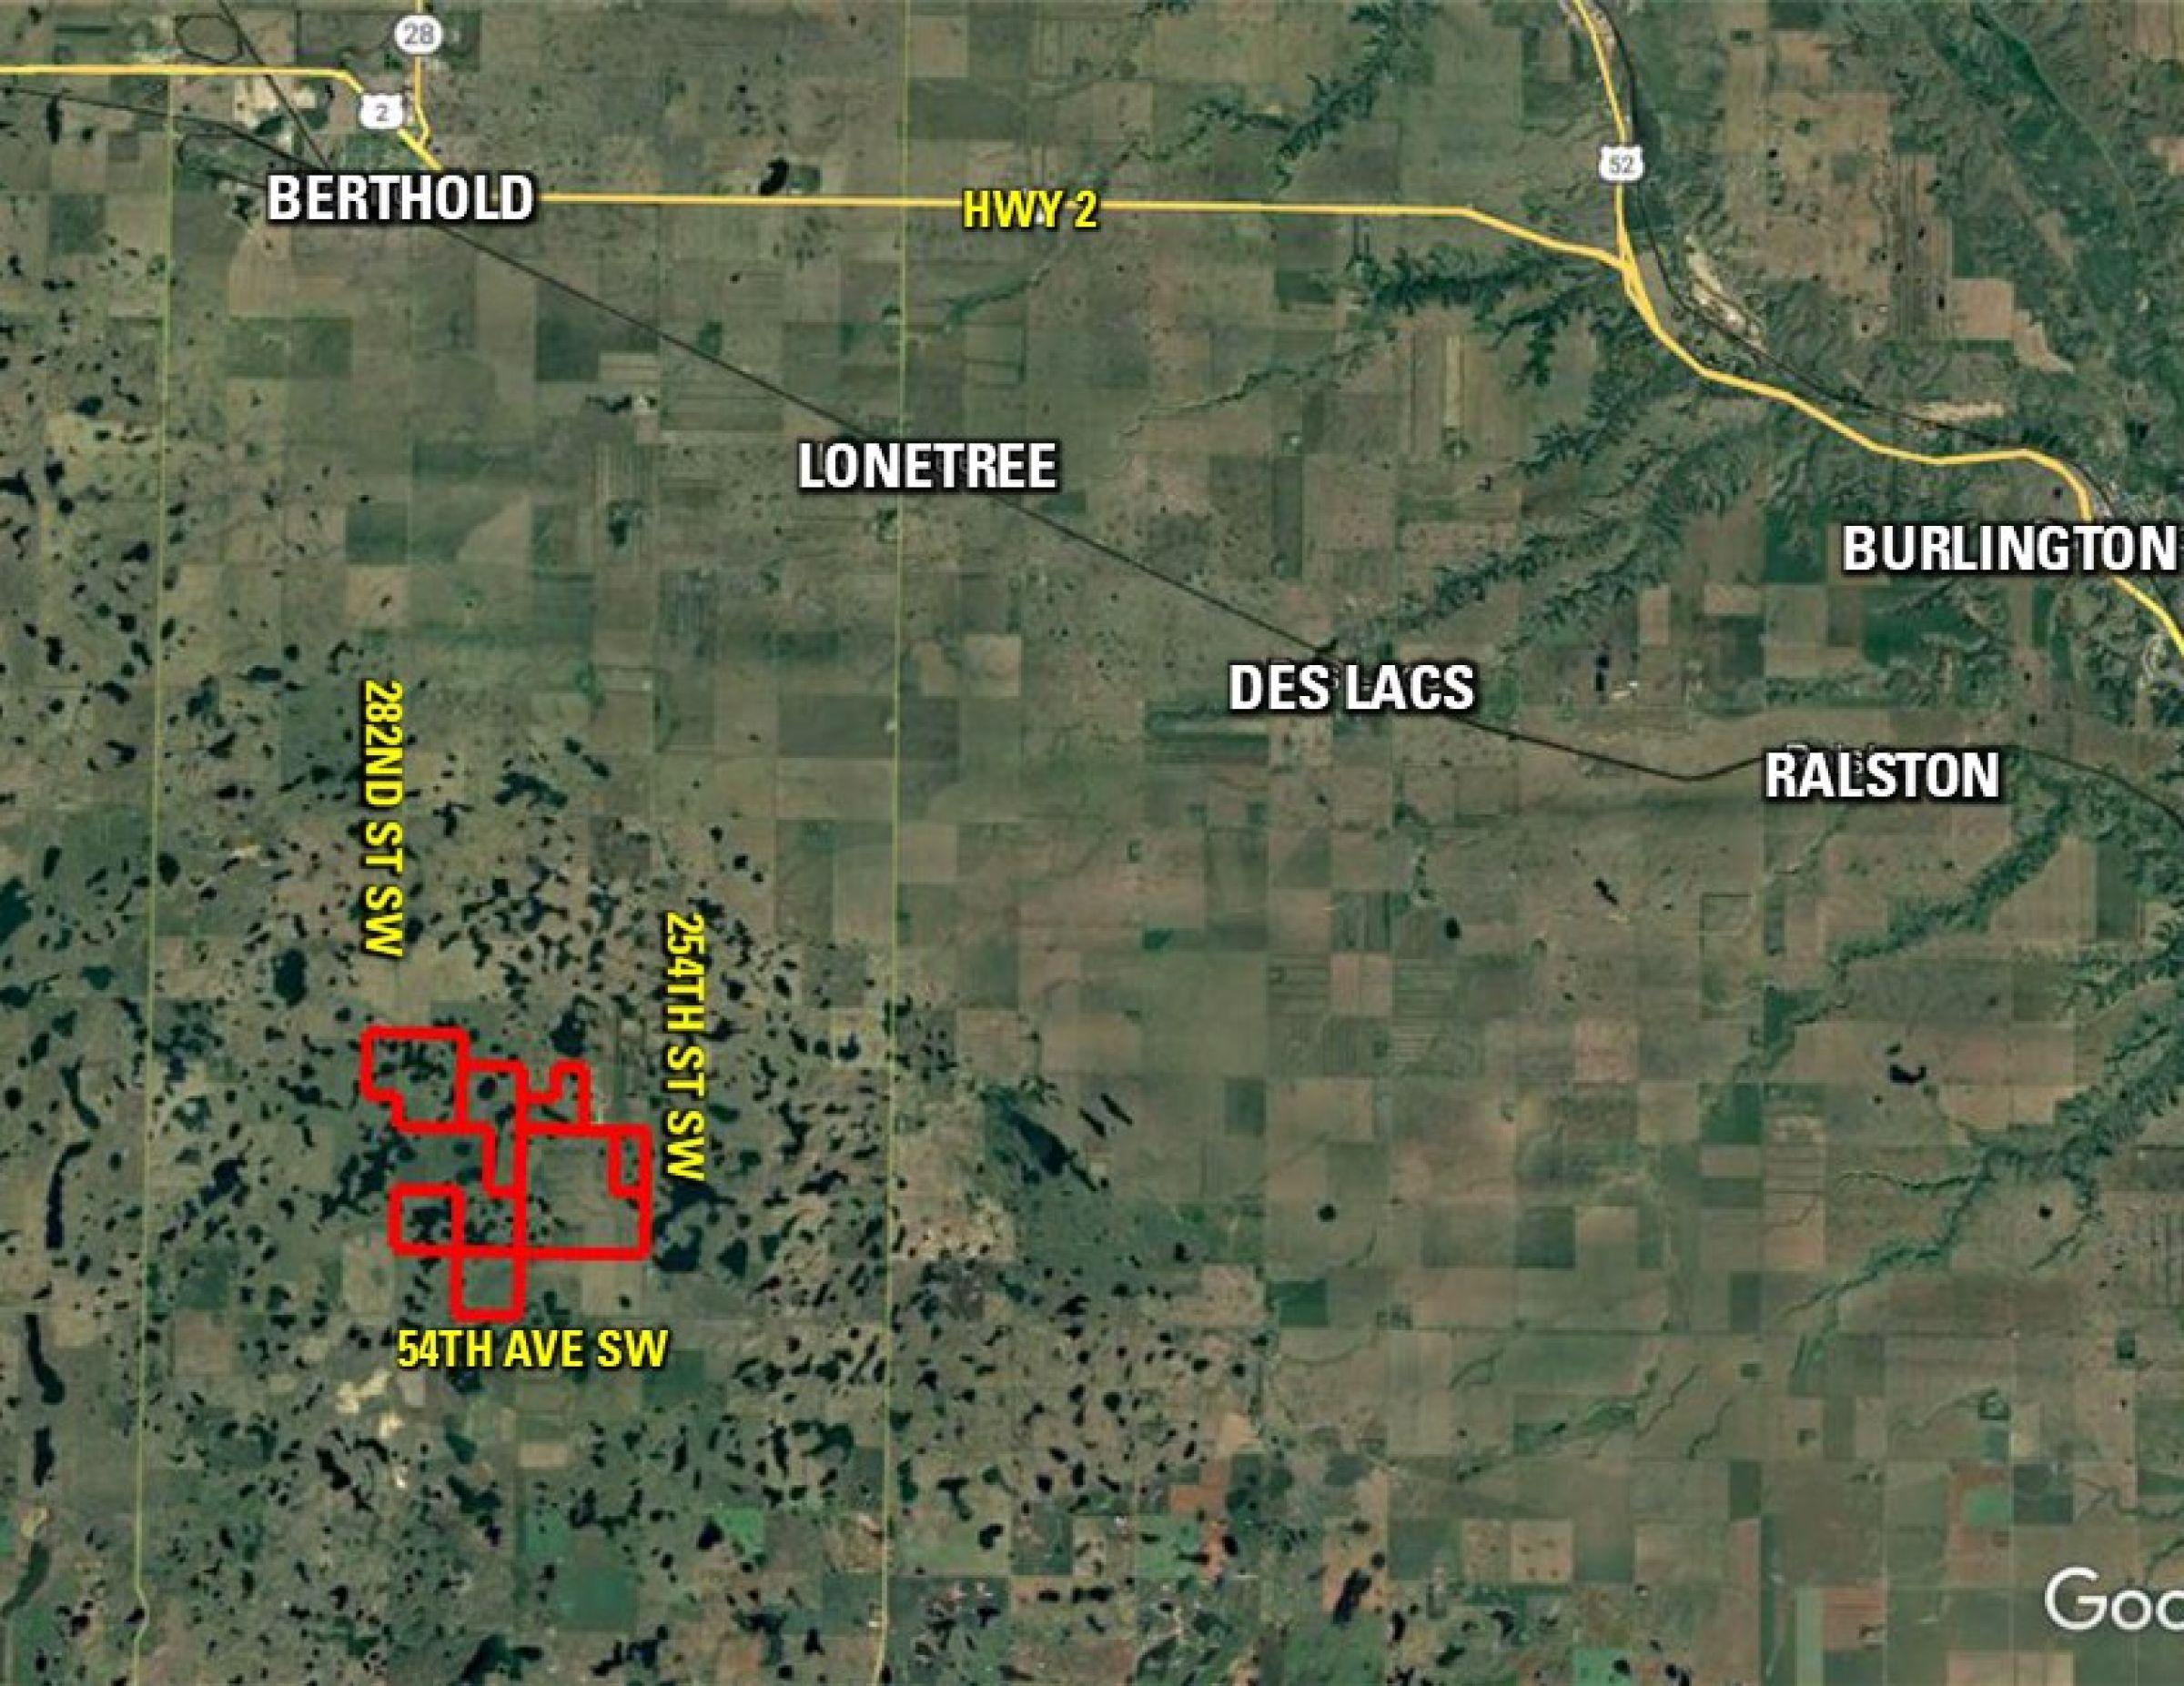 auctions-land-ward-county-north-dakota-1636-acres-listing-number-15736-1-2021-09-10-201018.jpg